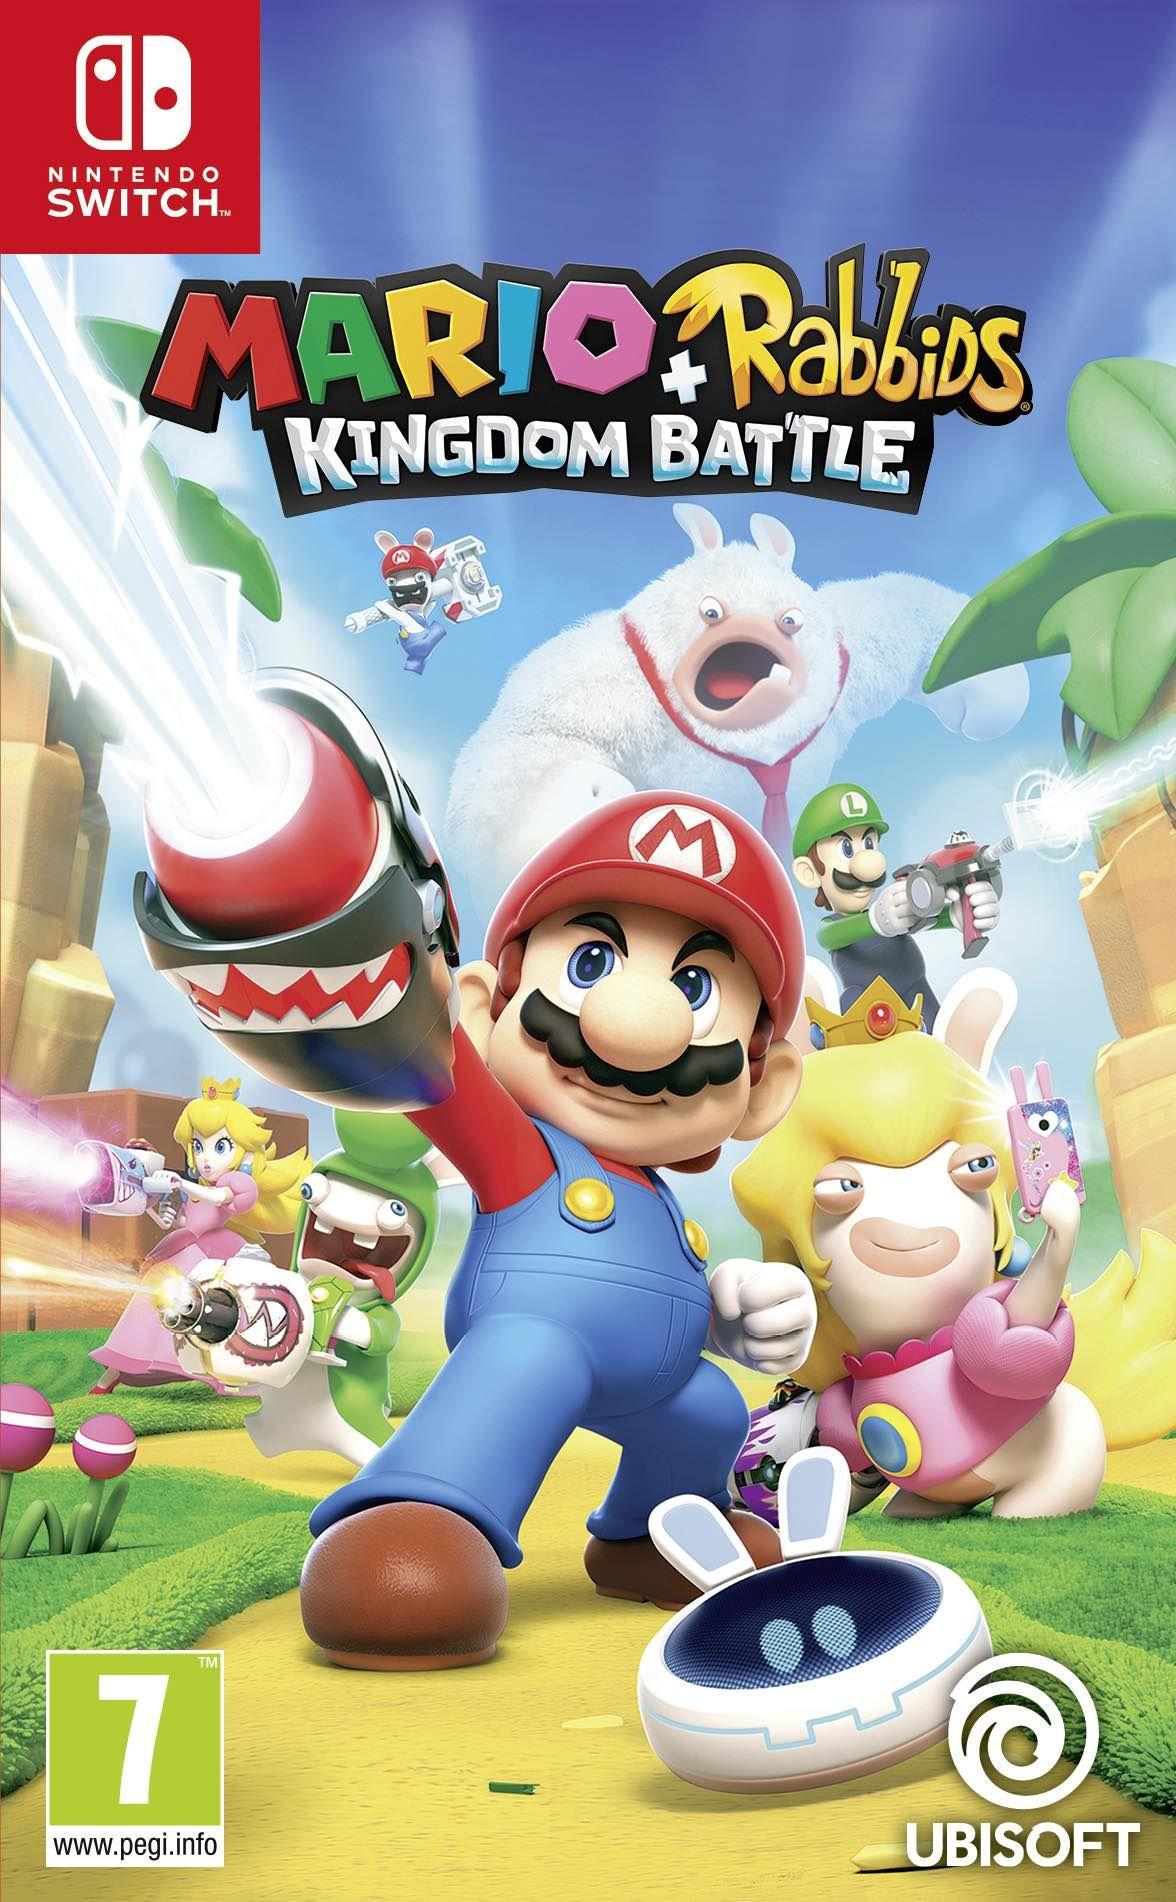 Mario & Rabbids: Kingdom Battle (Nintendo Switch) - 1